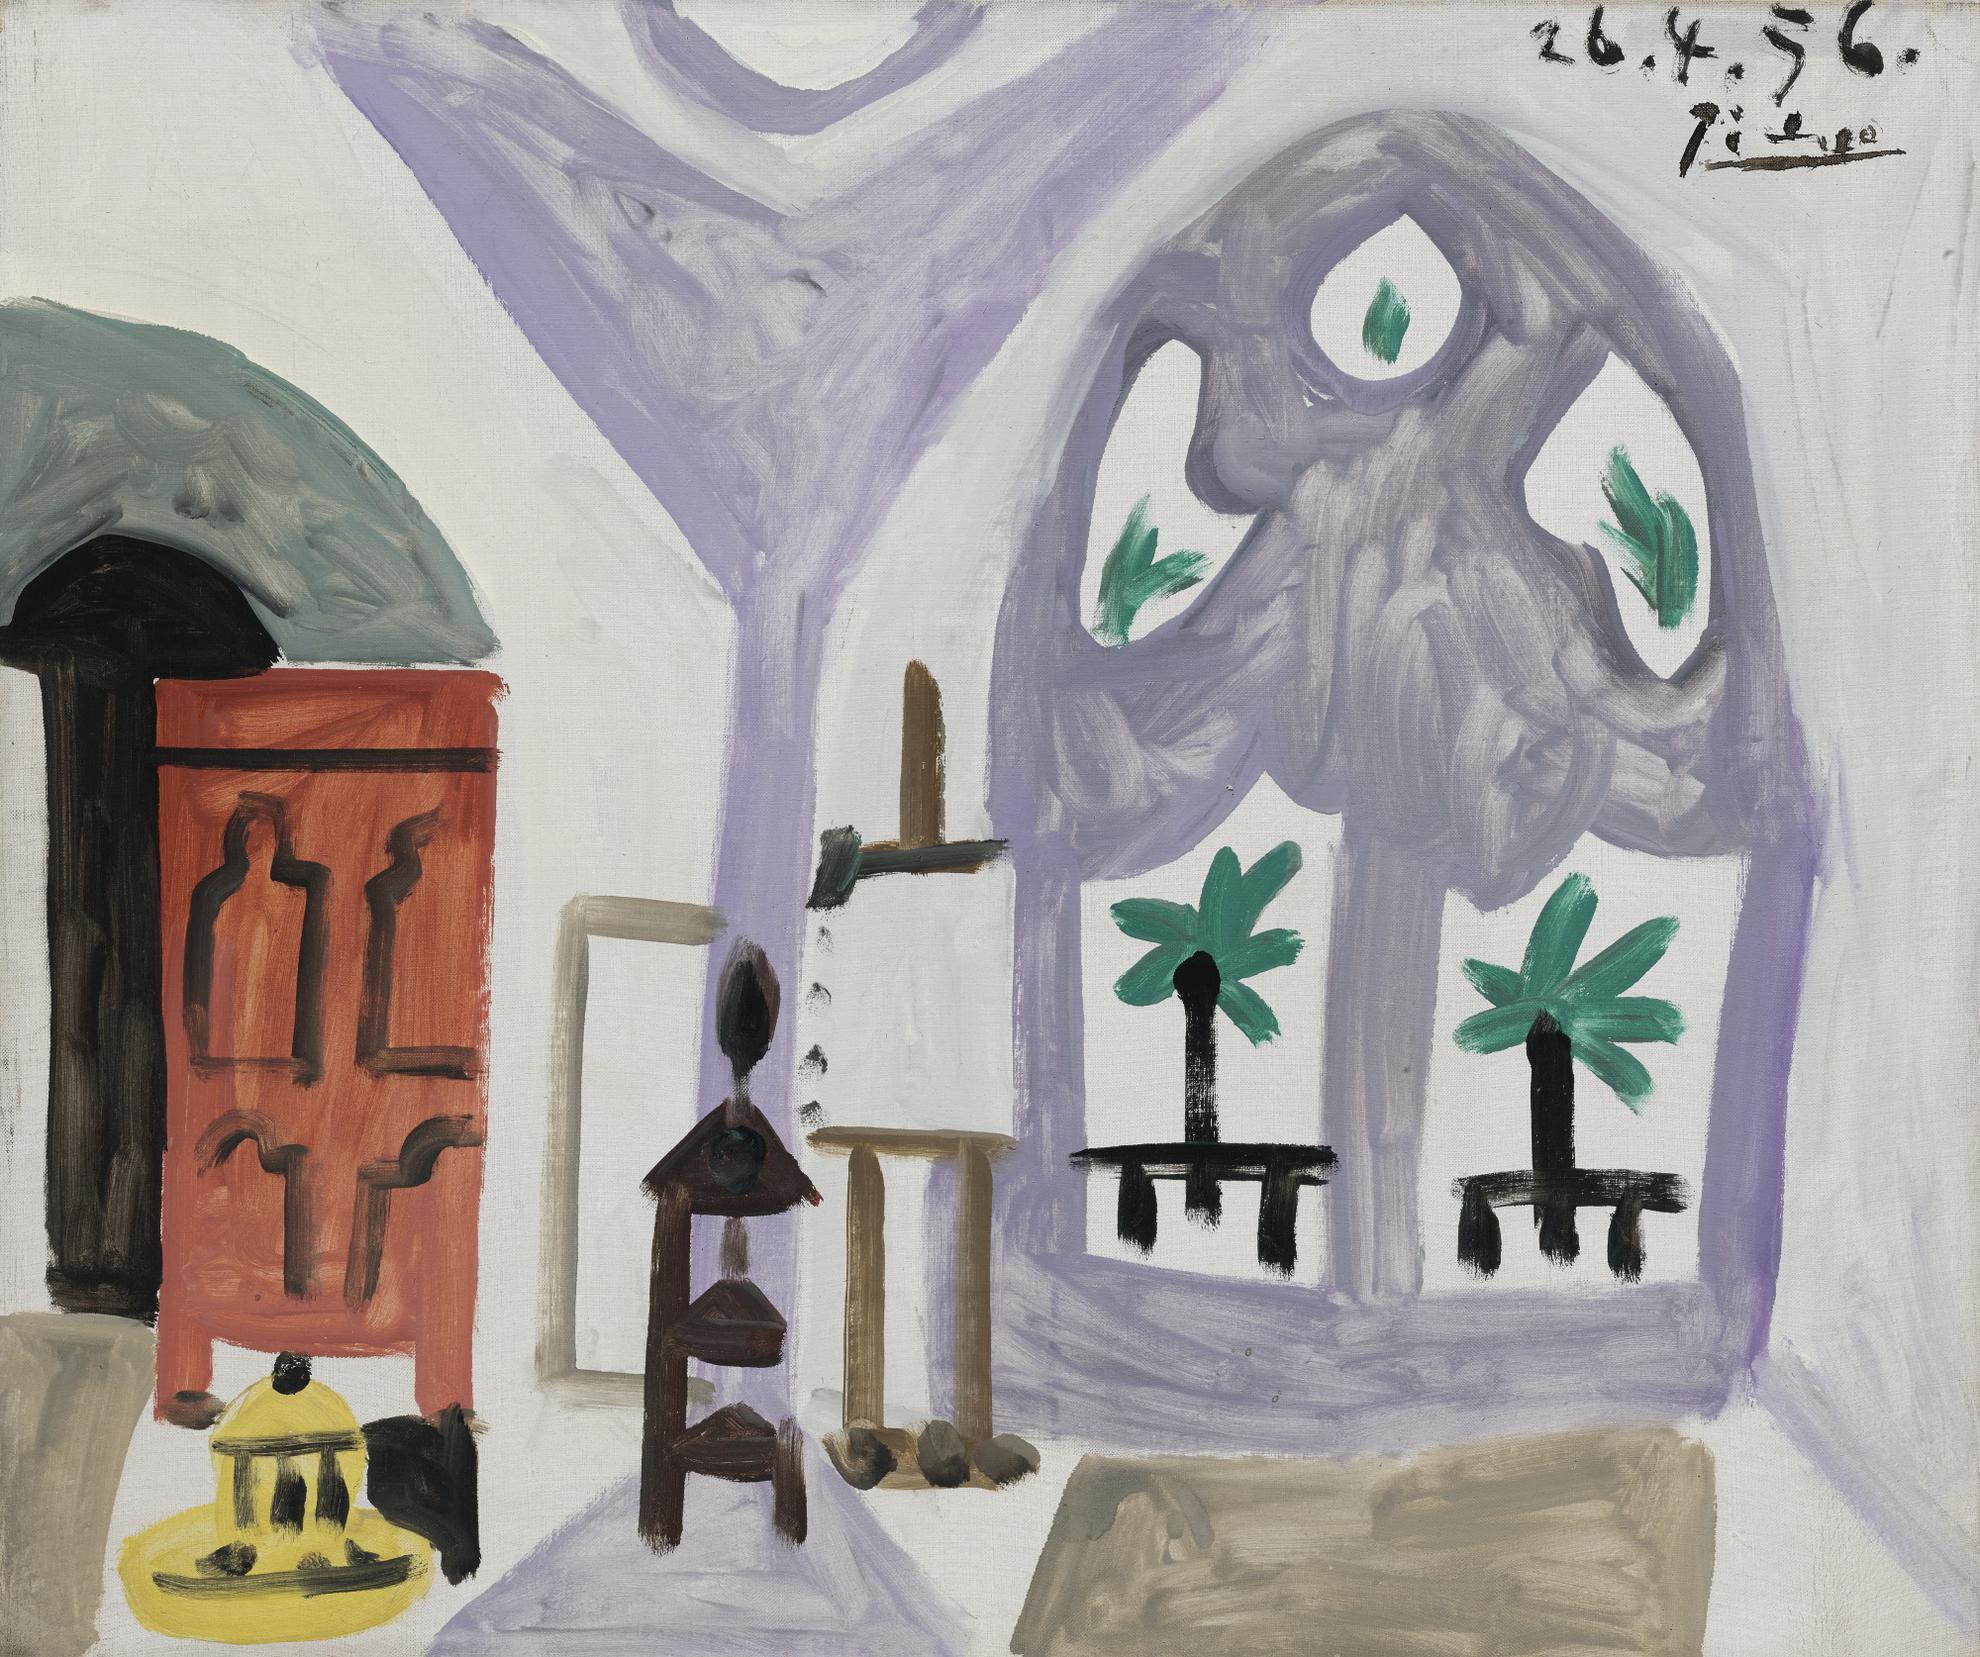 Pablo Picasso-Latelier-1956